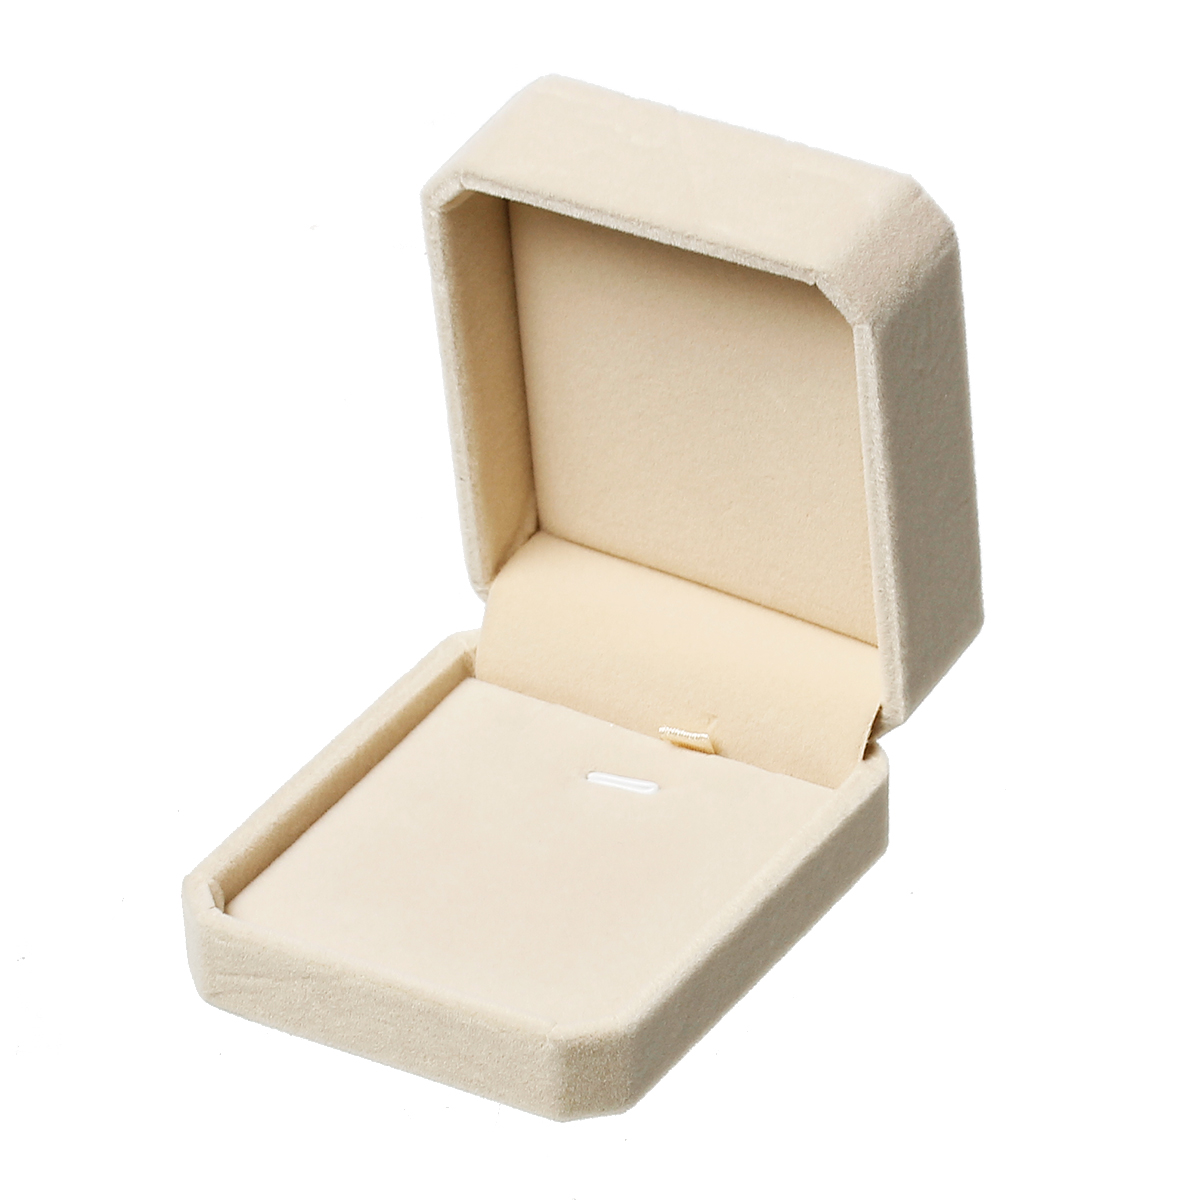 Doreen Box Plastic Velvet Jewelry Necklace Gift Boxes Rectangle